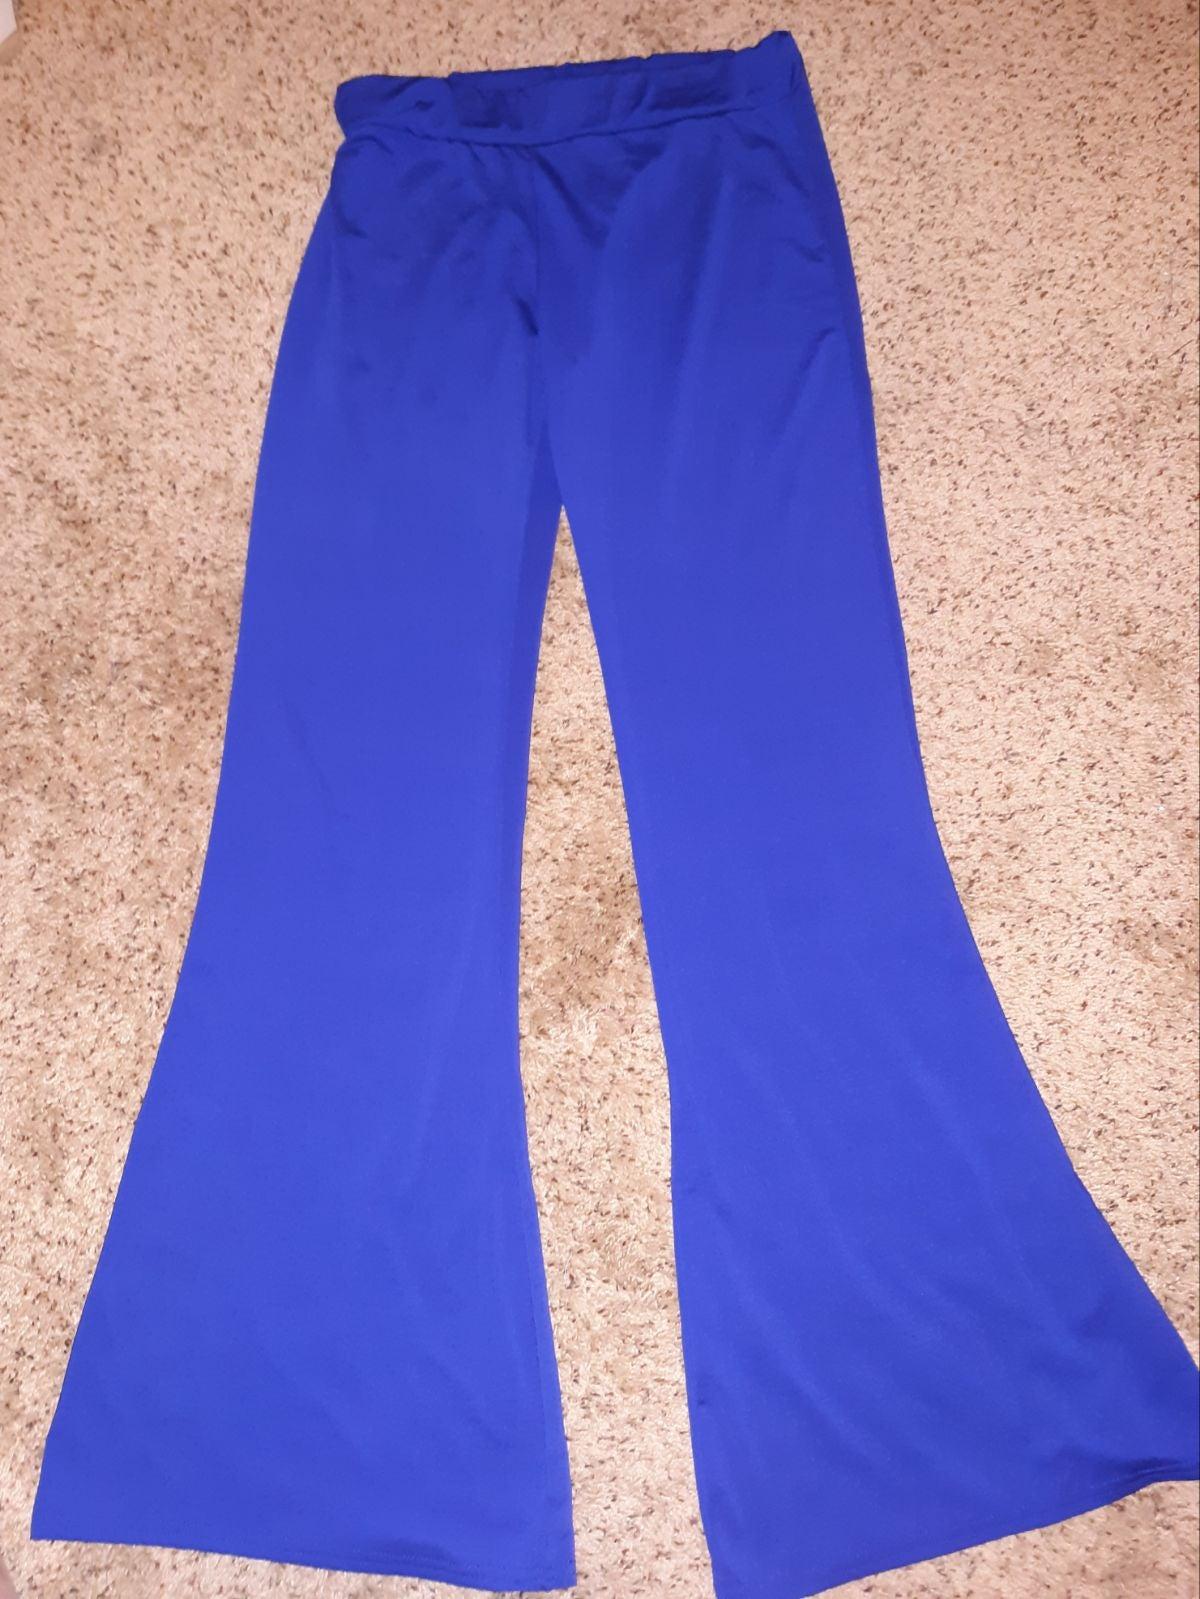 Women's Royal Blue Yoga pants